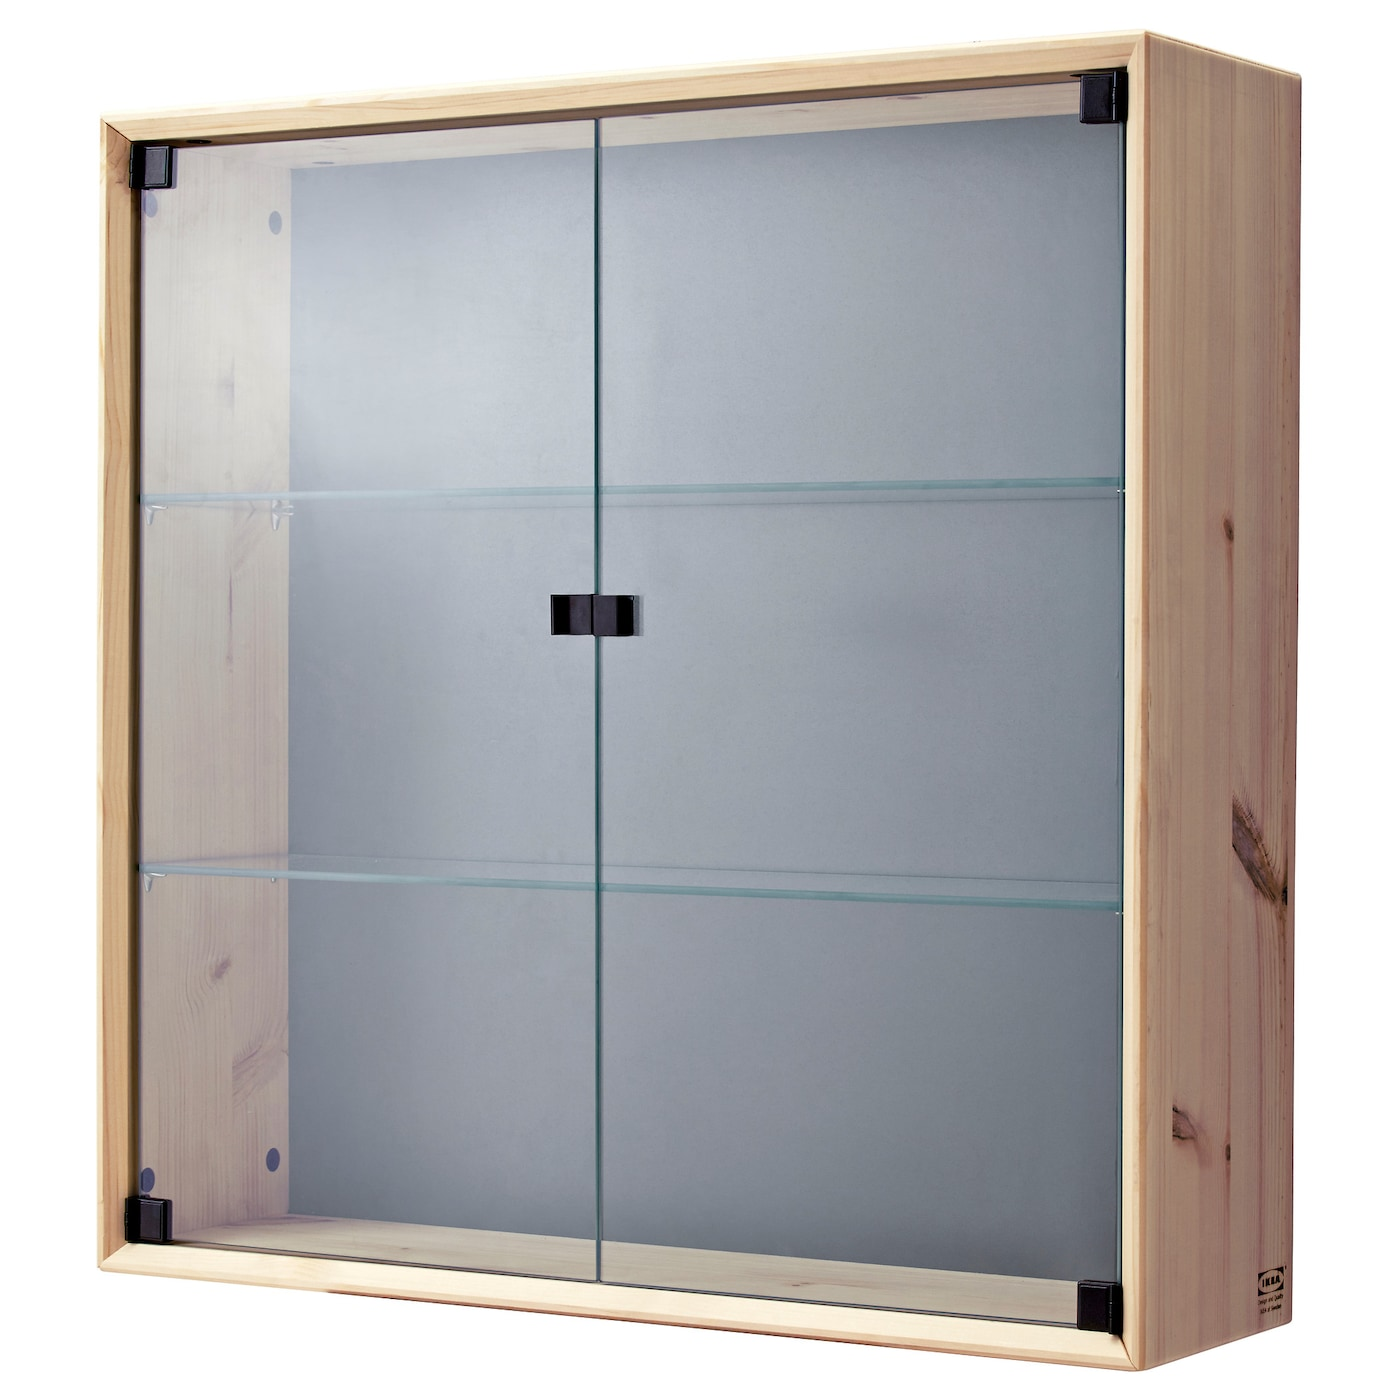 Norn s glass door wall cabinet pine 70x70 cm ikea - Vitrina cristal ikea ...